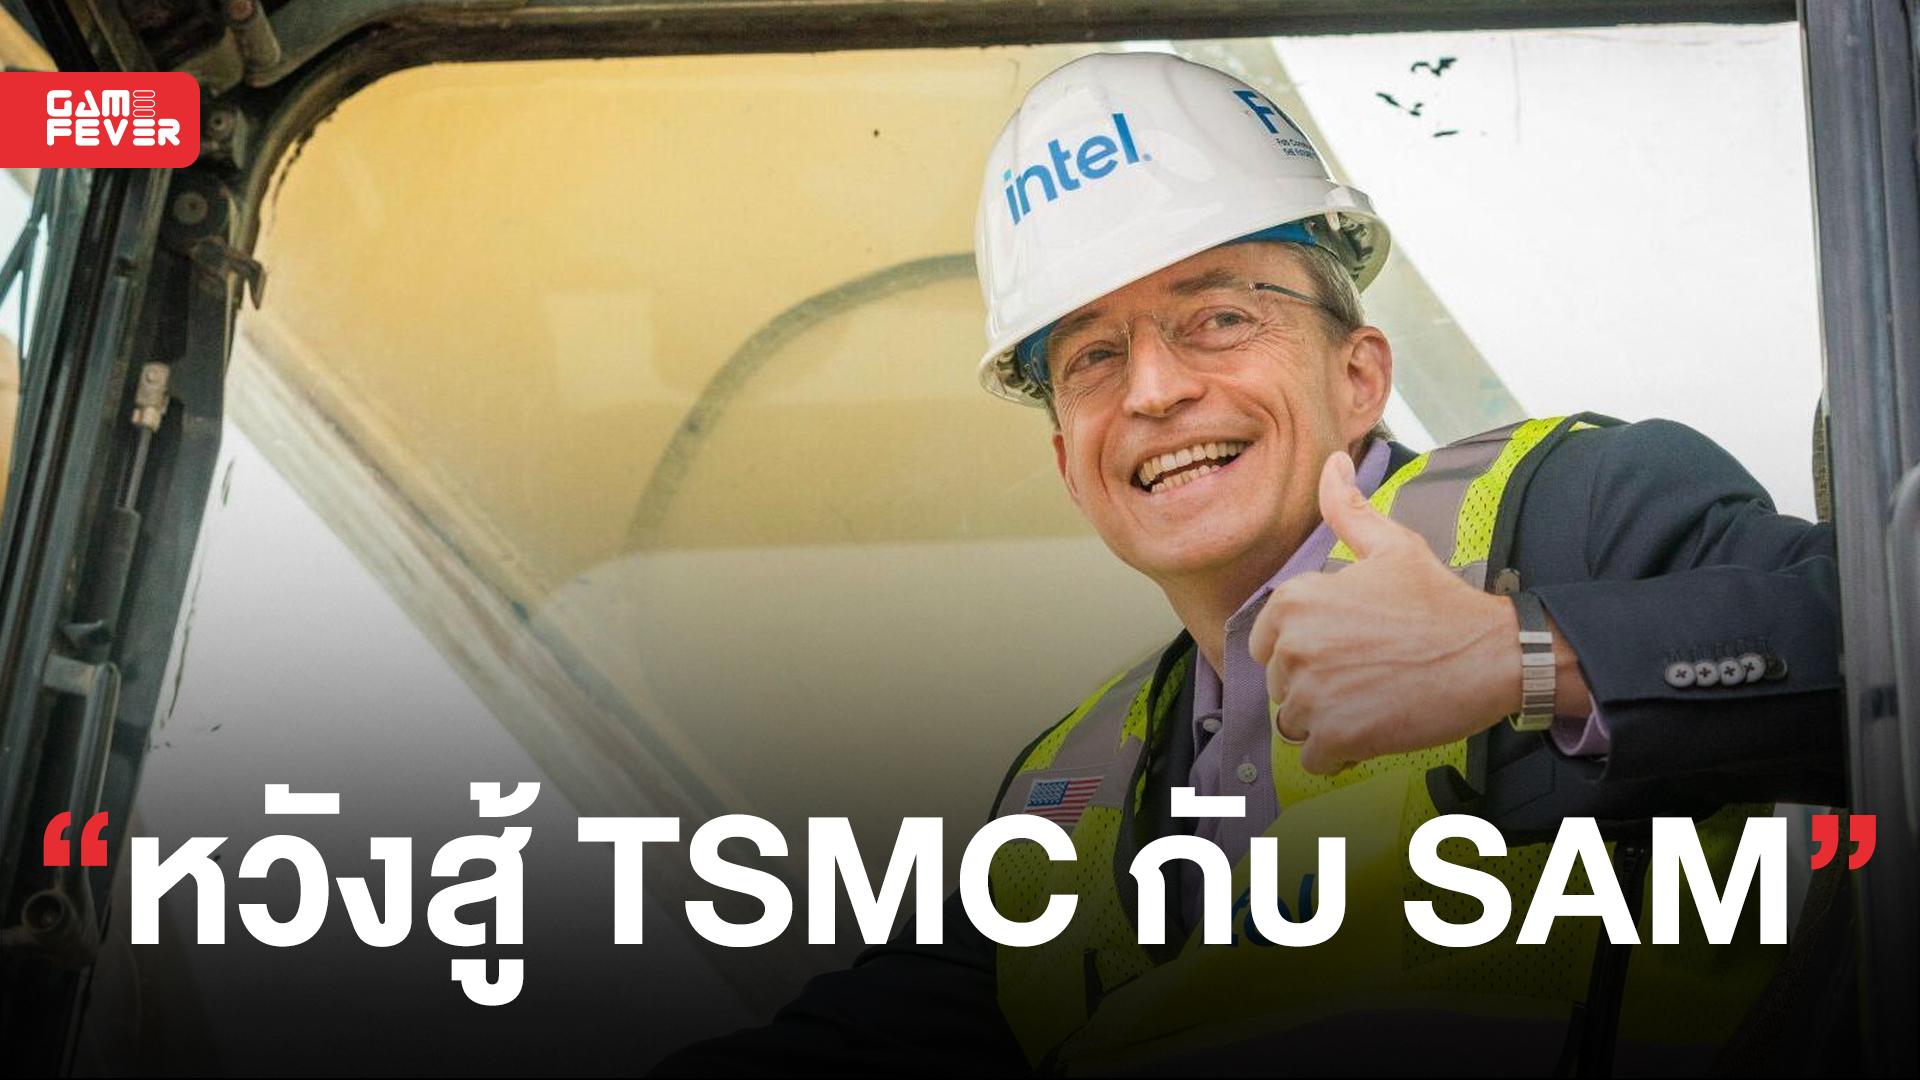 Intel เริ่มสร้างโรงงานผลิตชิปใหม่หวังสู้ TSMC กับ Samsung เสร็จหลังปี 2024!